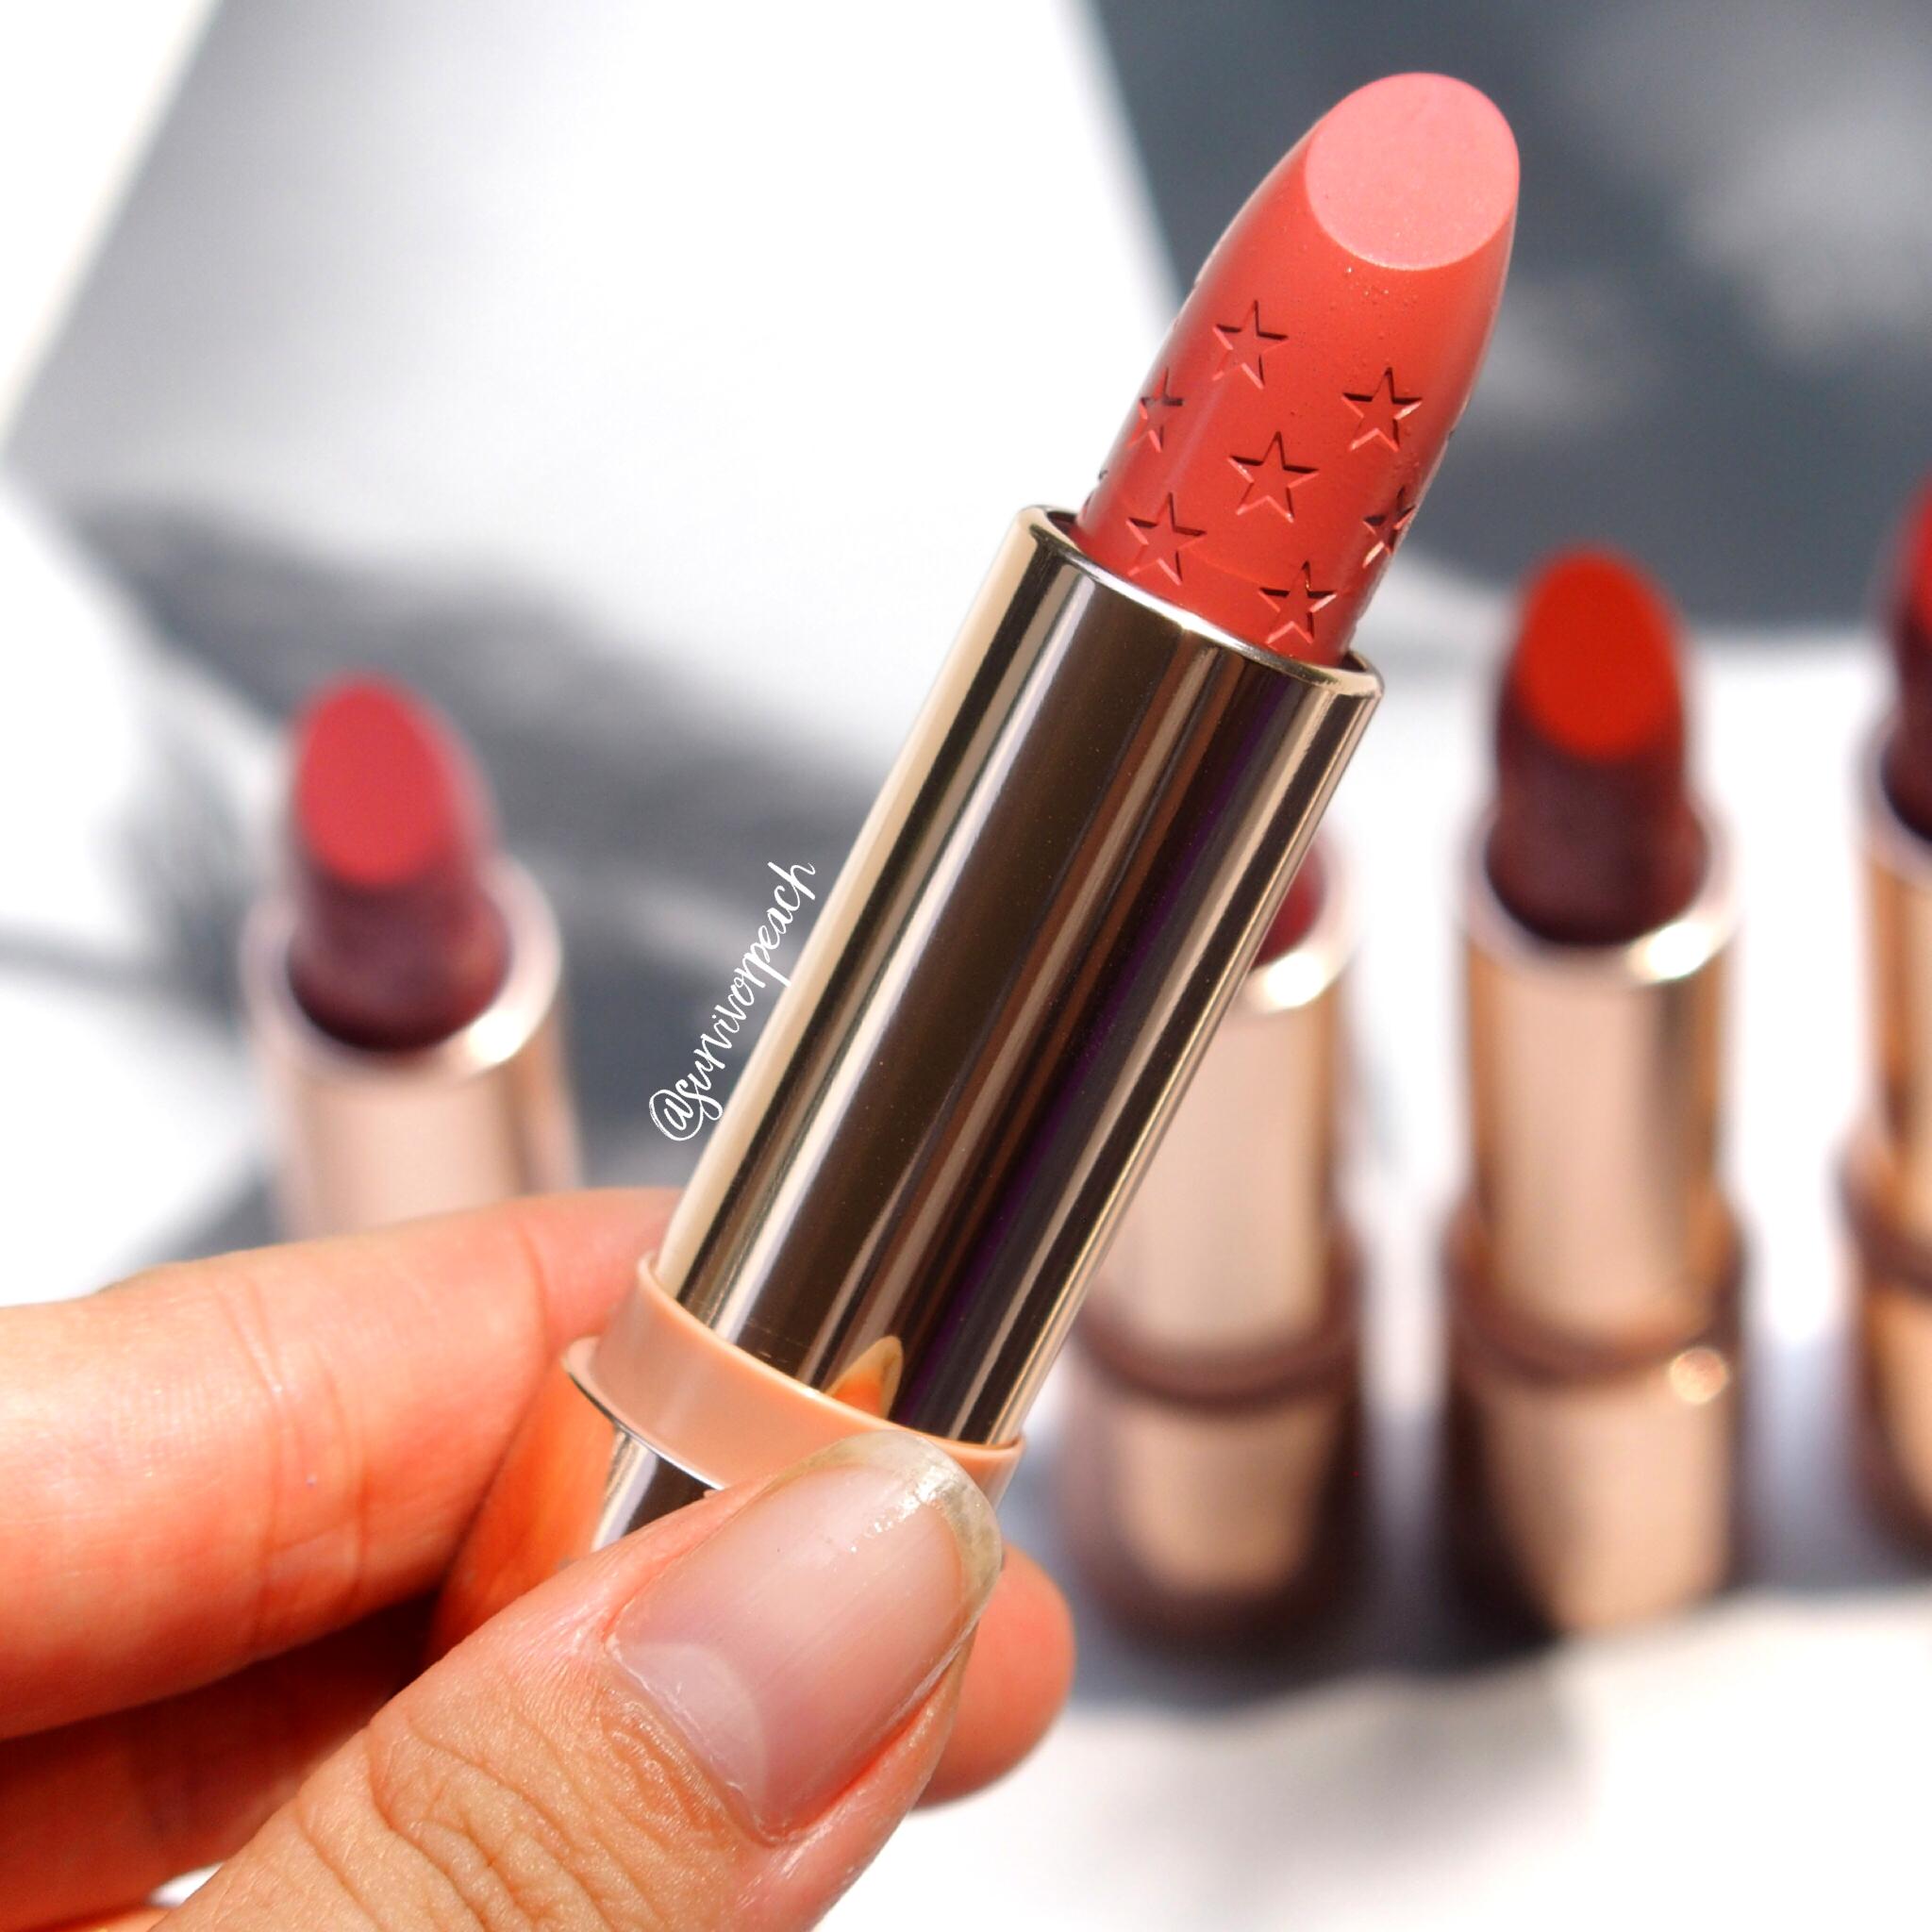 Colourpop Matte Lux Lipstick in Name Drop